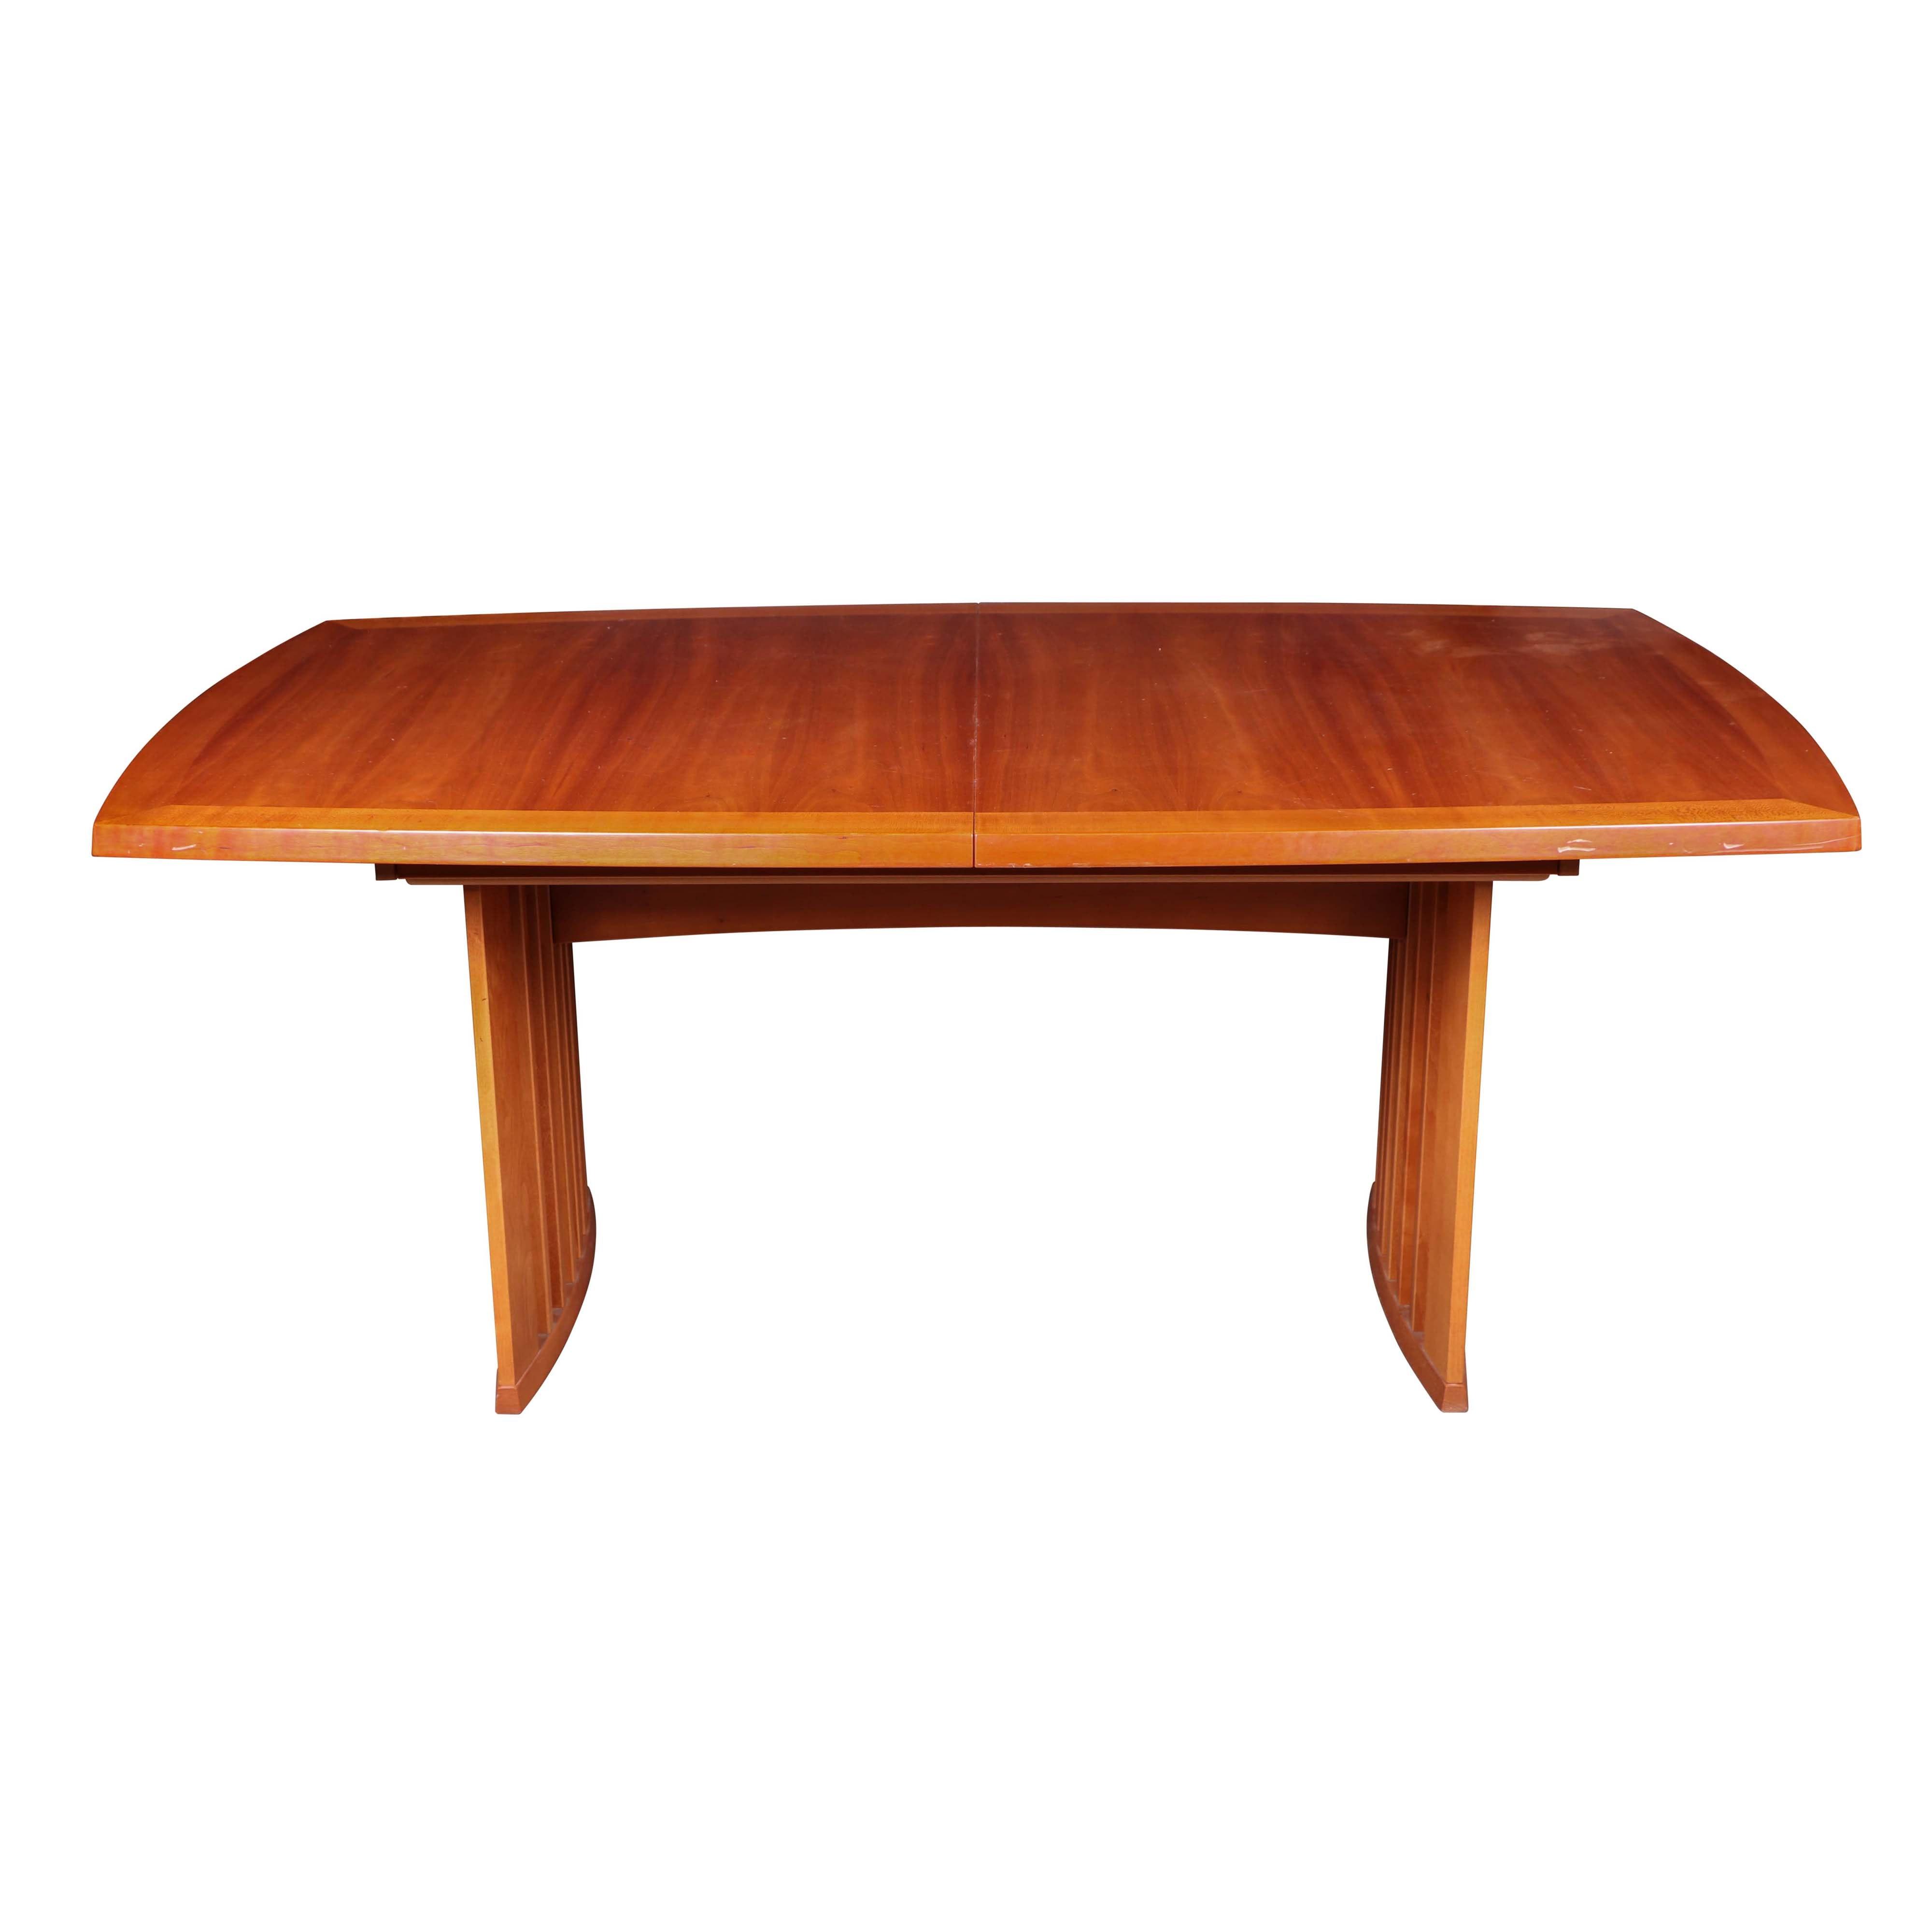 Danish Modern Teak Dining Table by Skovby, 20th Century